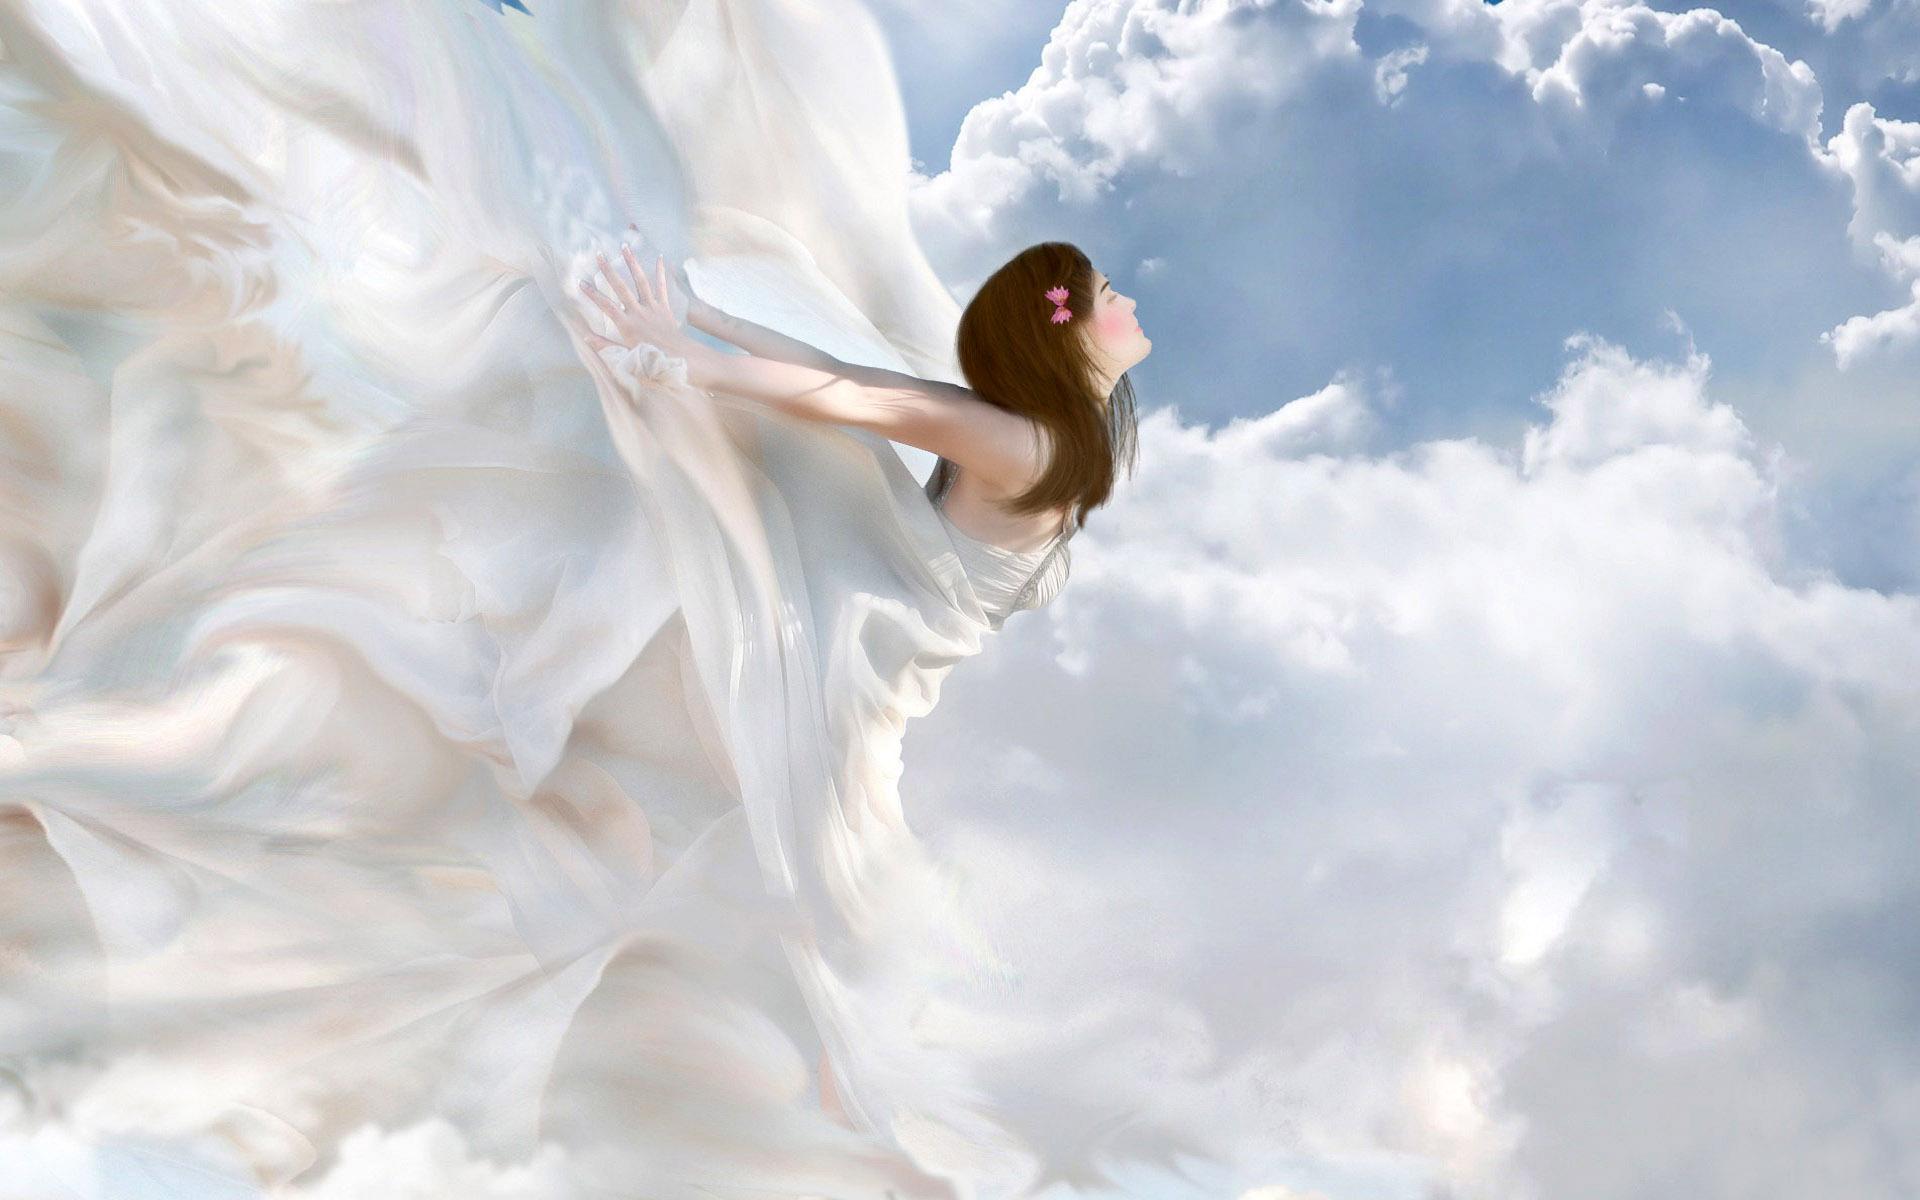 Открытке днем, картинка ангелы на облаках